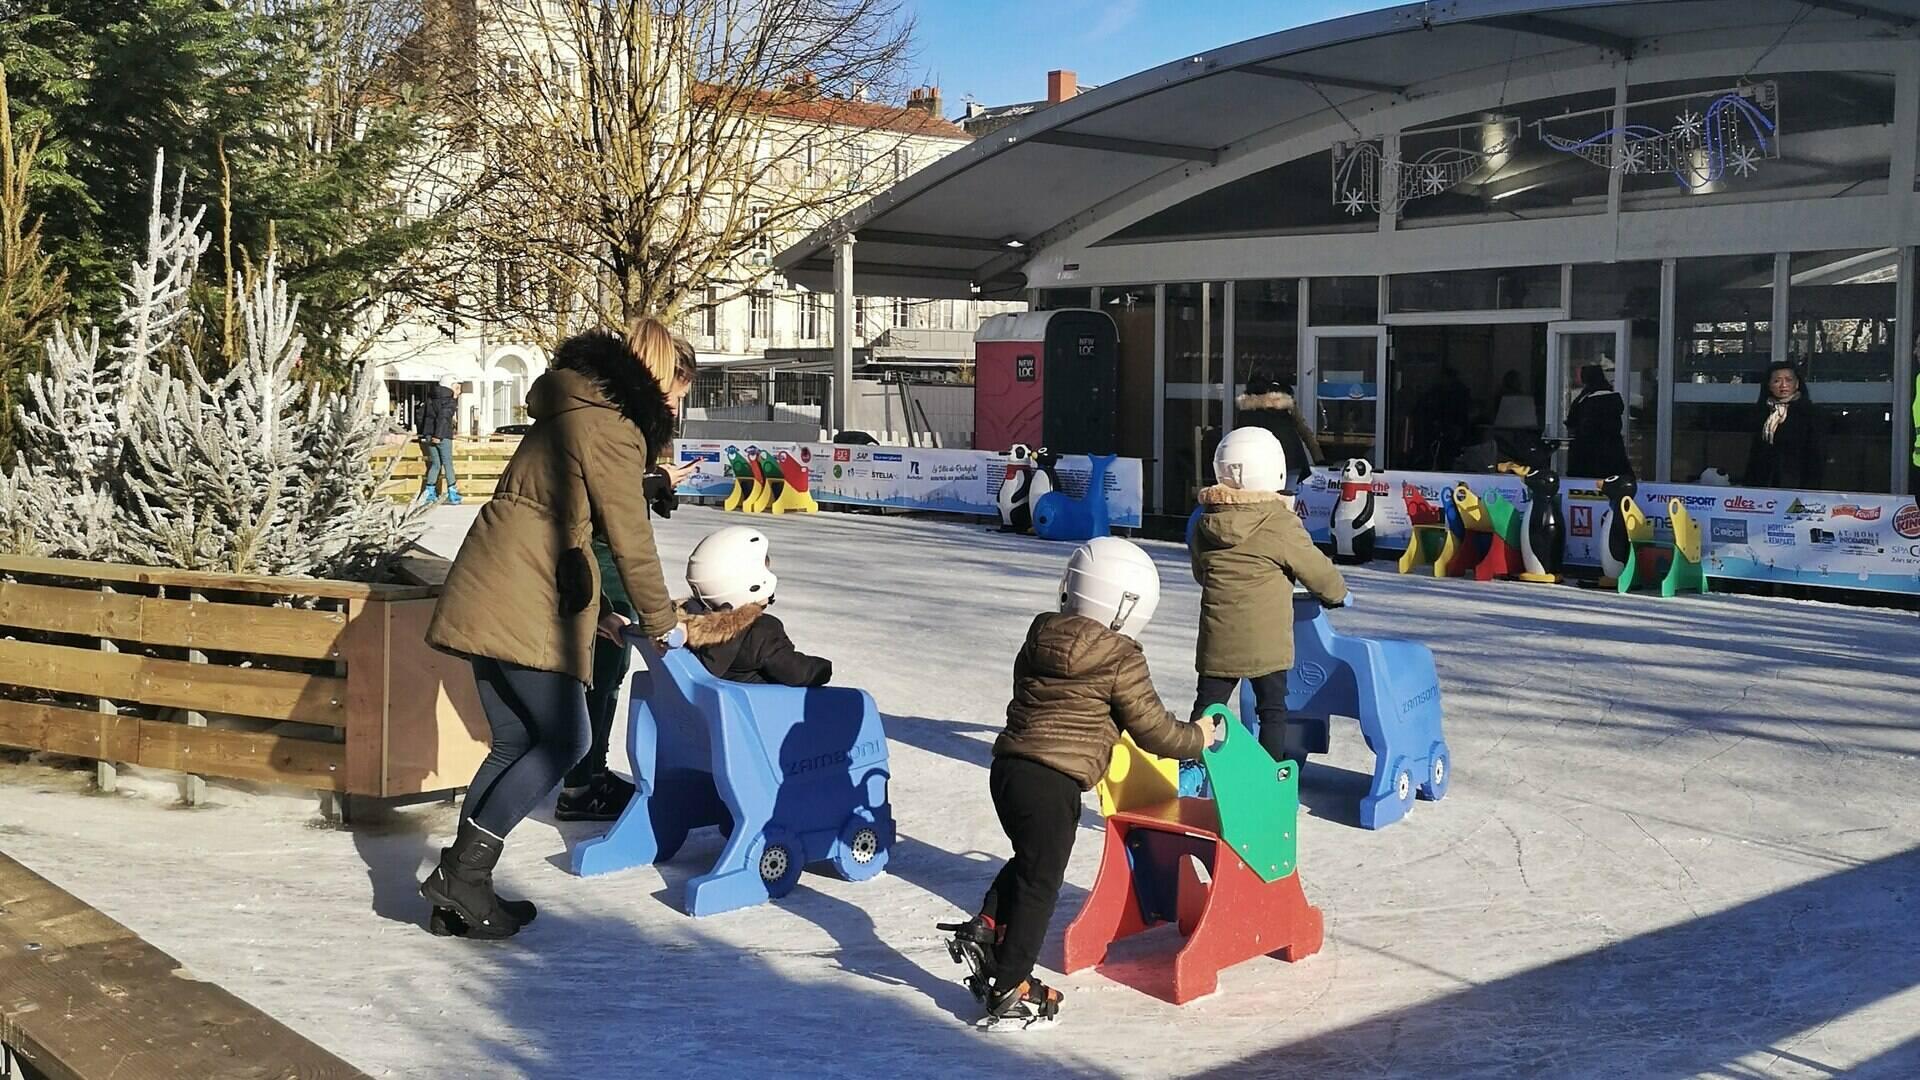 patinoire enfant rochefort